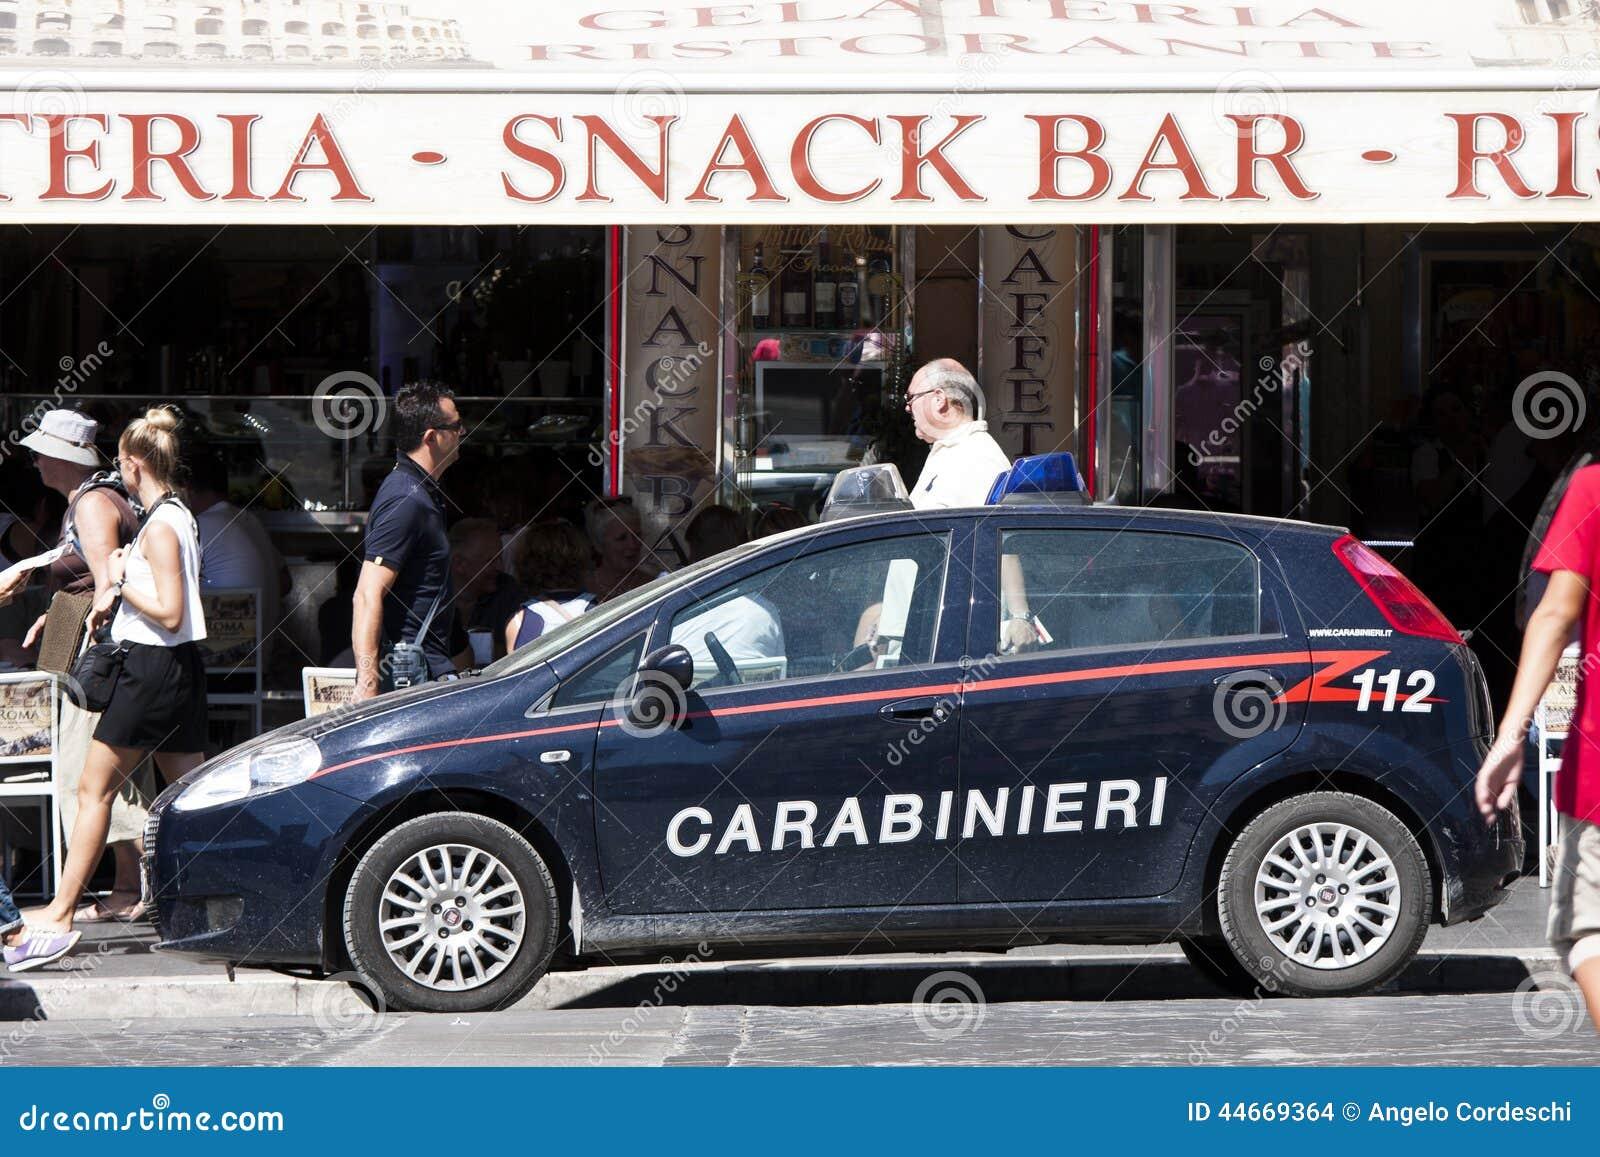 voiture de police italienne carabinieri 112 image stock ditorial image 44669364. Black Bedroom Furniture Sets. Home Design Ideas